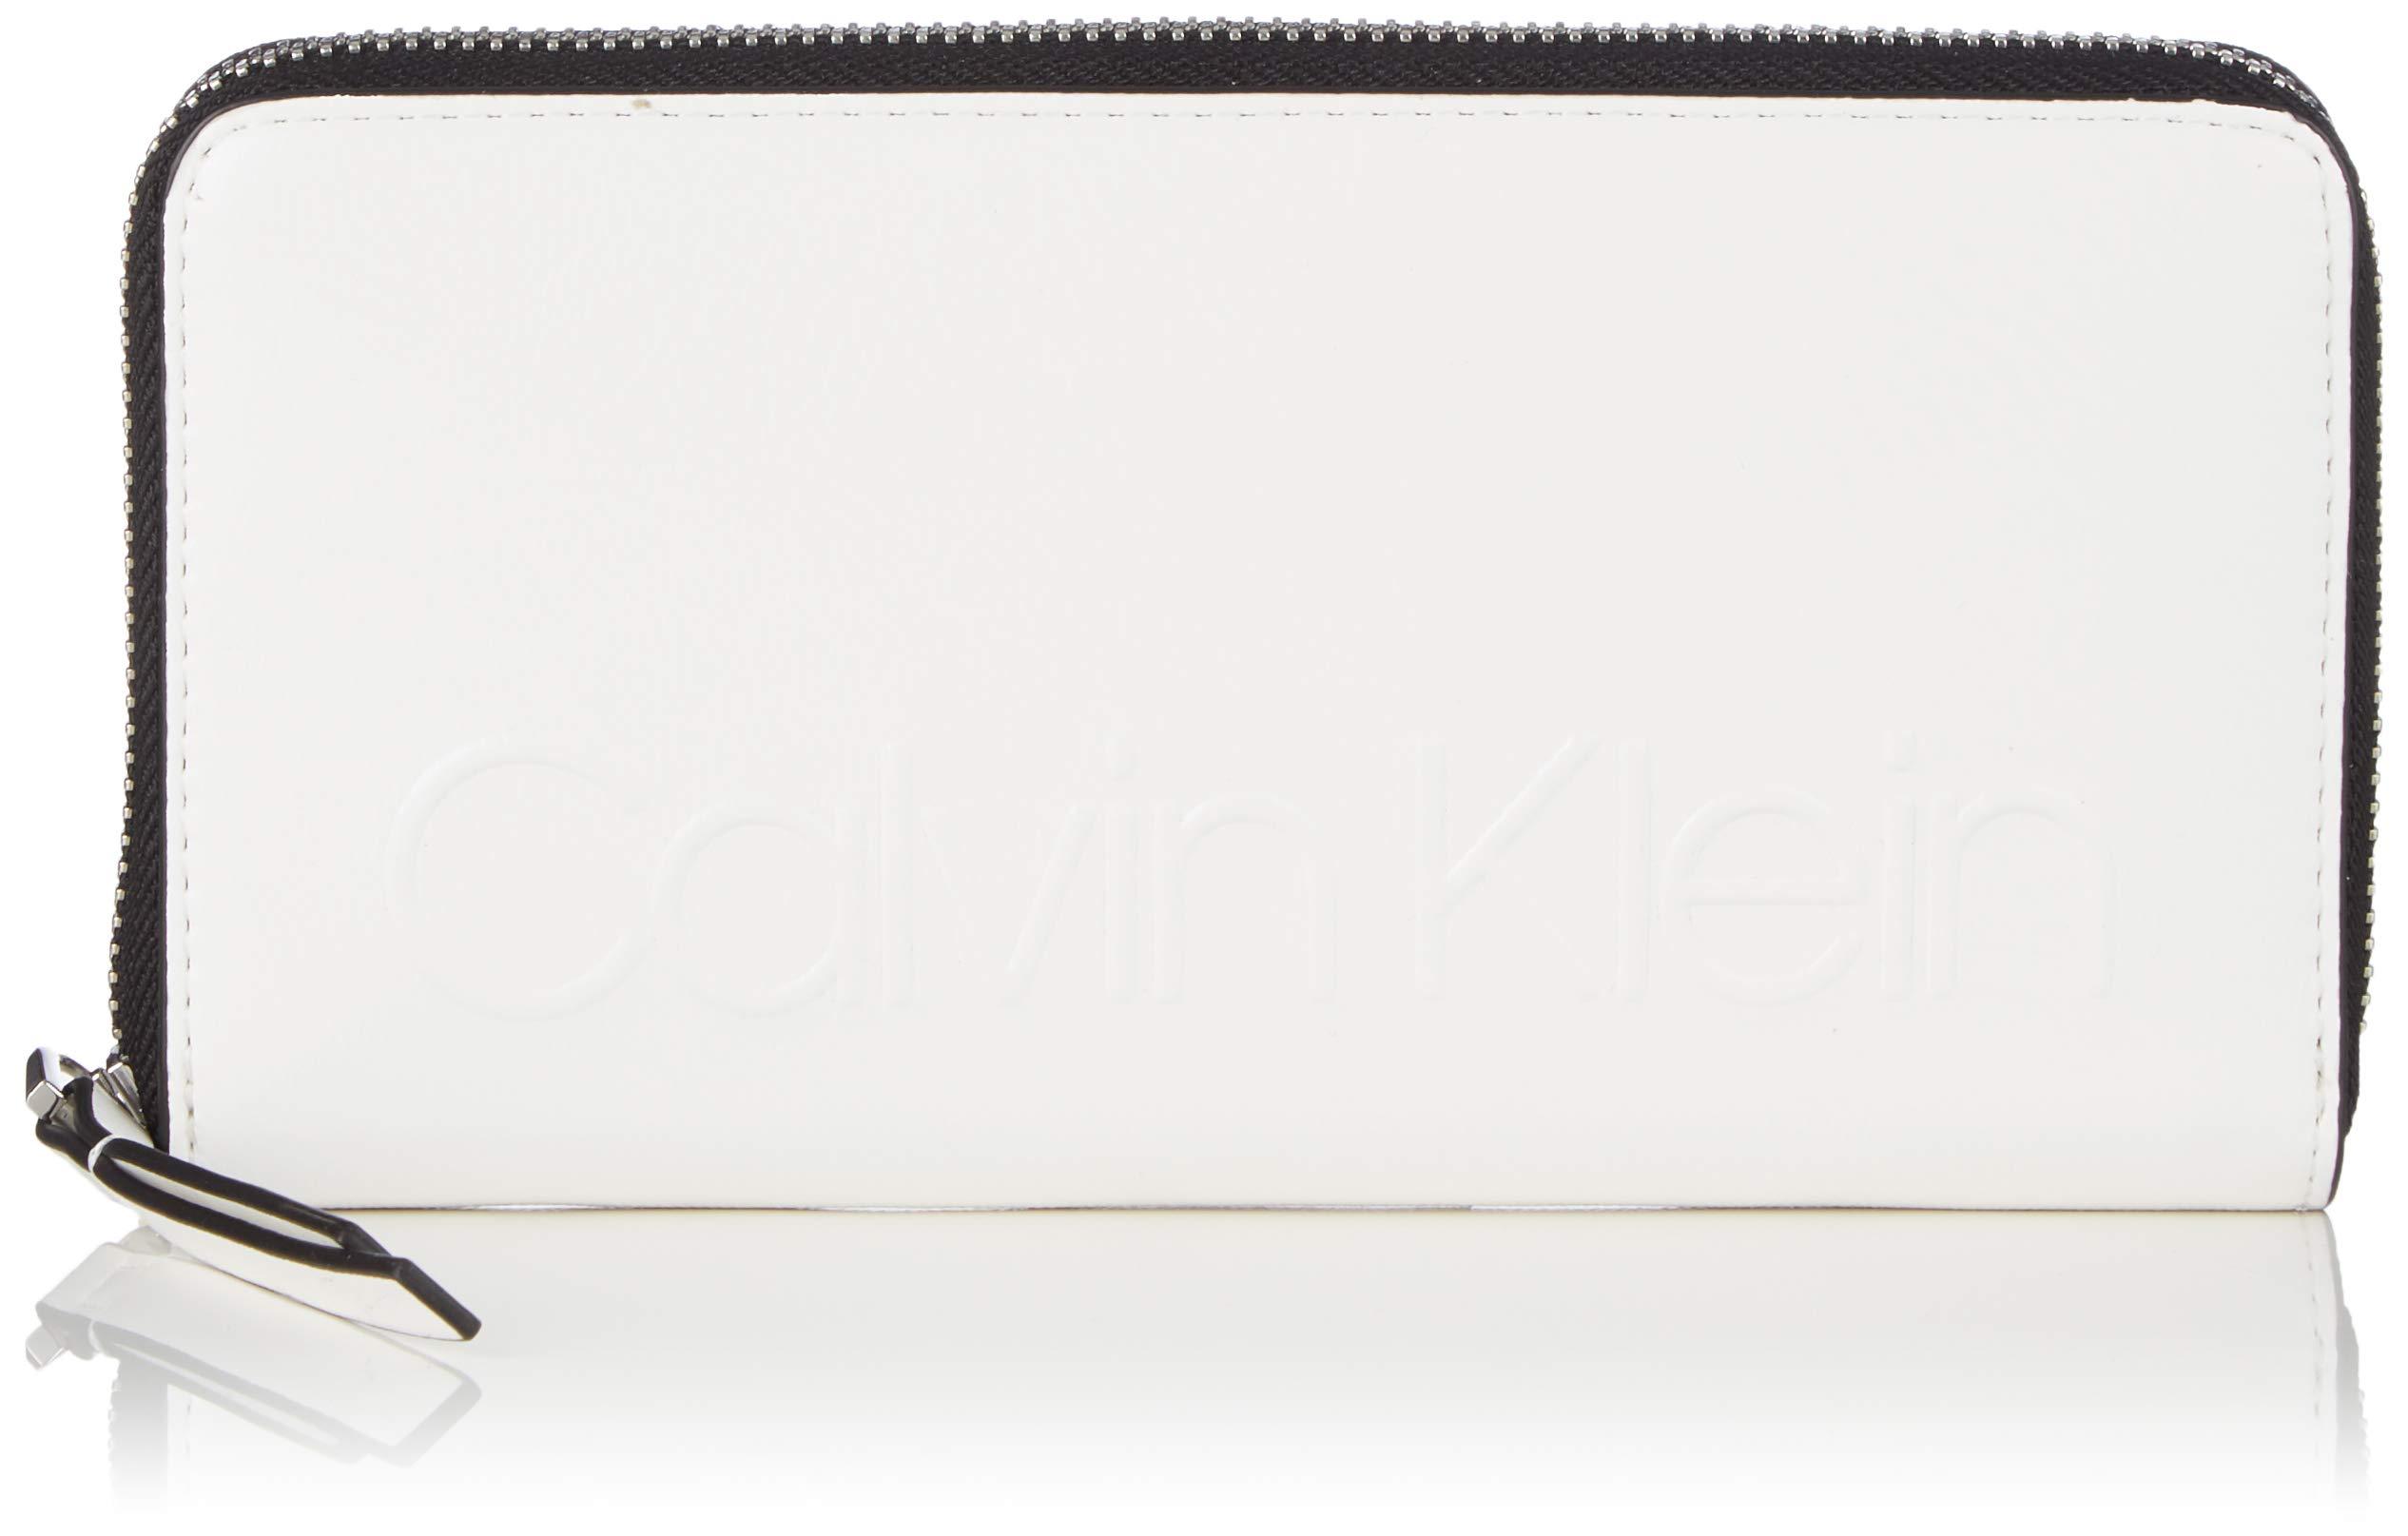 Klein H Calvin Edged Cmb X T White10x2 Large SPortefeuilles Ziparound FemmeBlancbright 5x19 tBQrCsdxoh